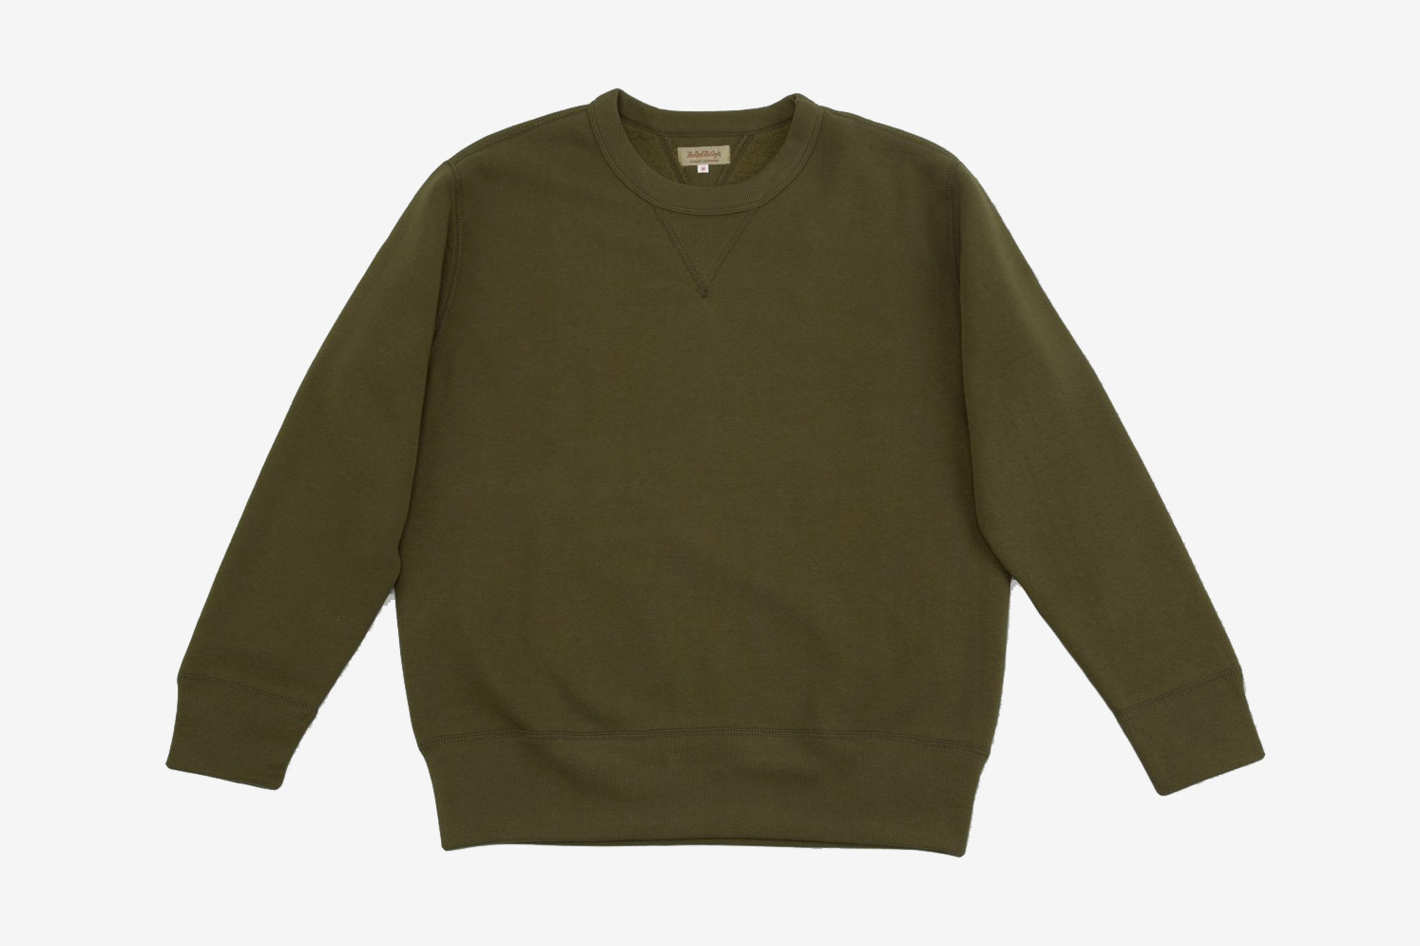 The Real McCoy's Loopwheel Crewneck Sweatshirt